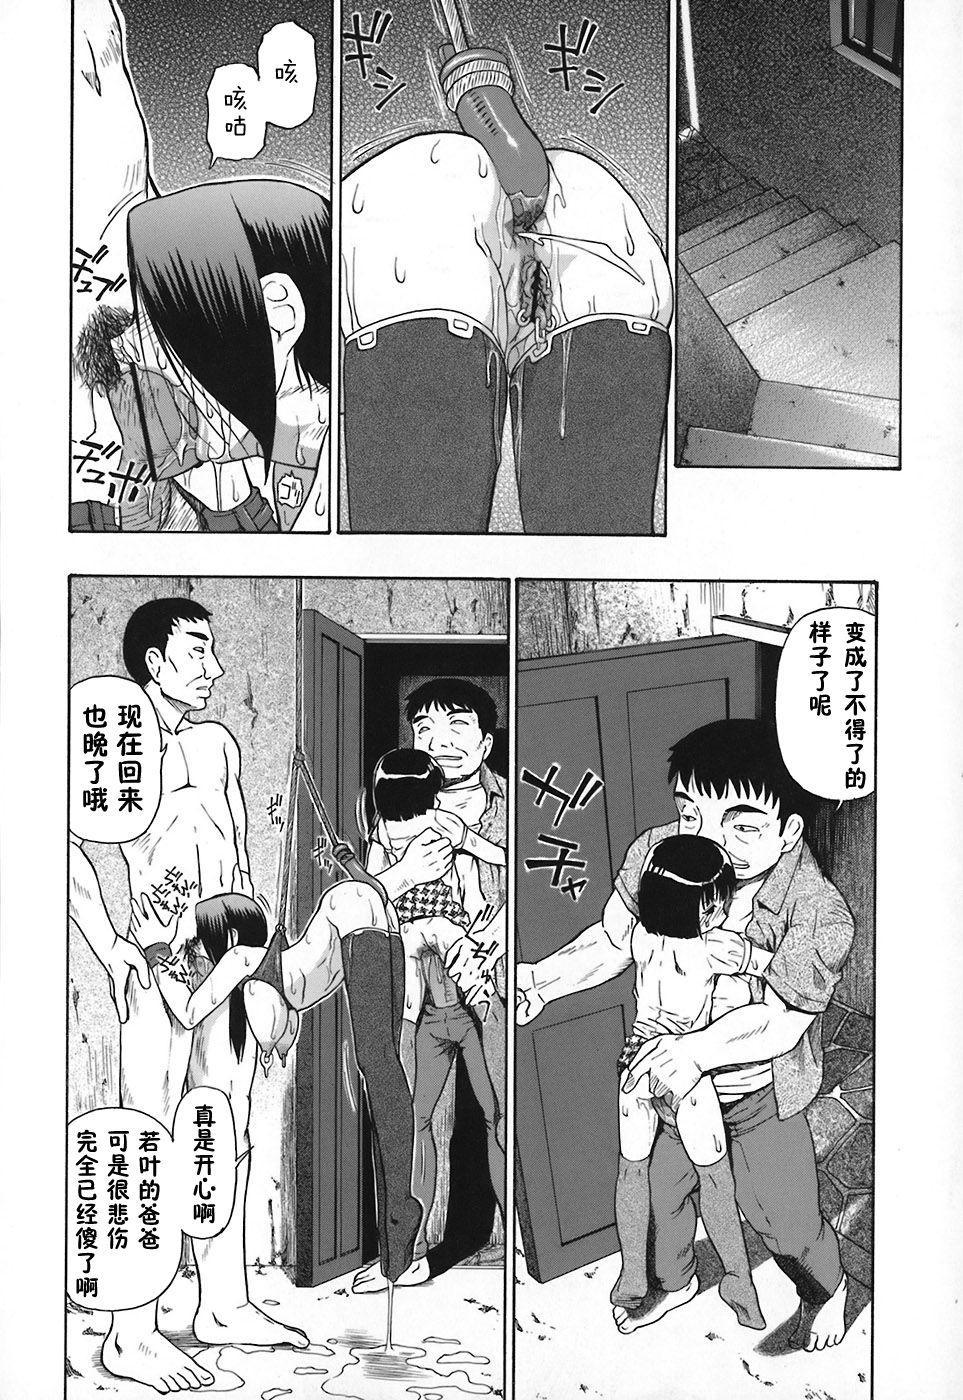 Akutoku no Sakae - Prosperites du Vice 99